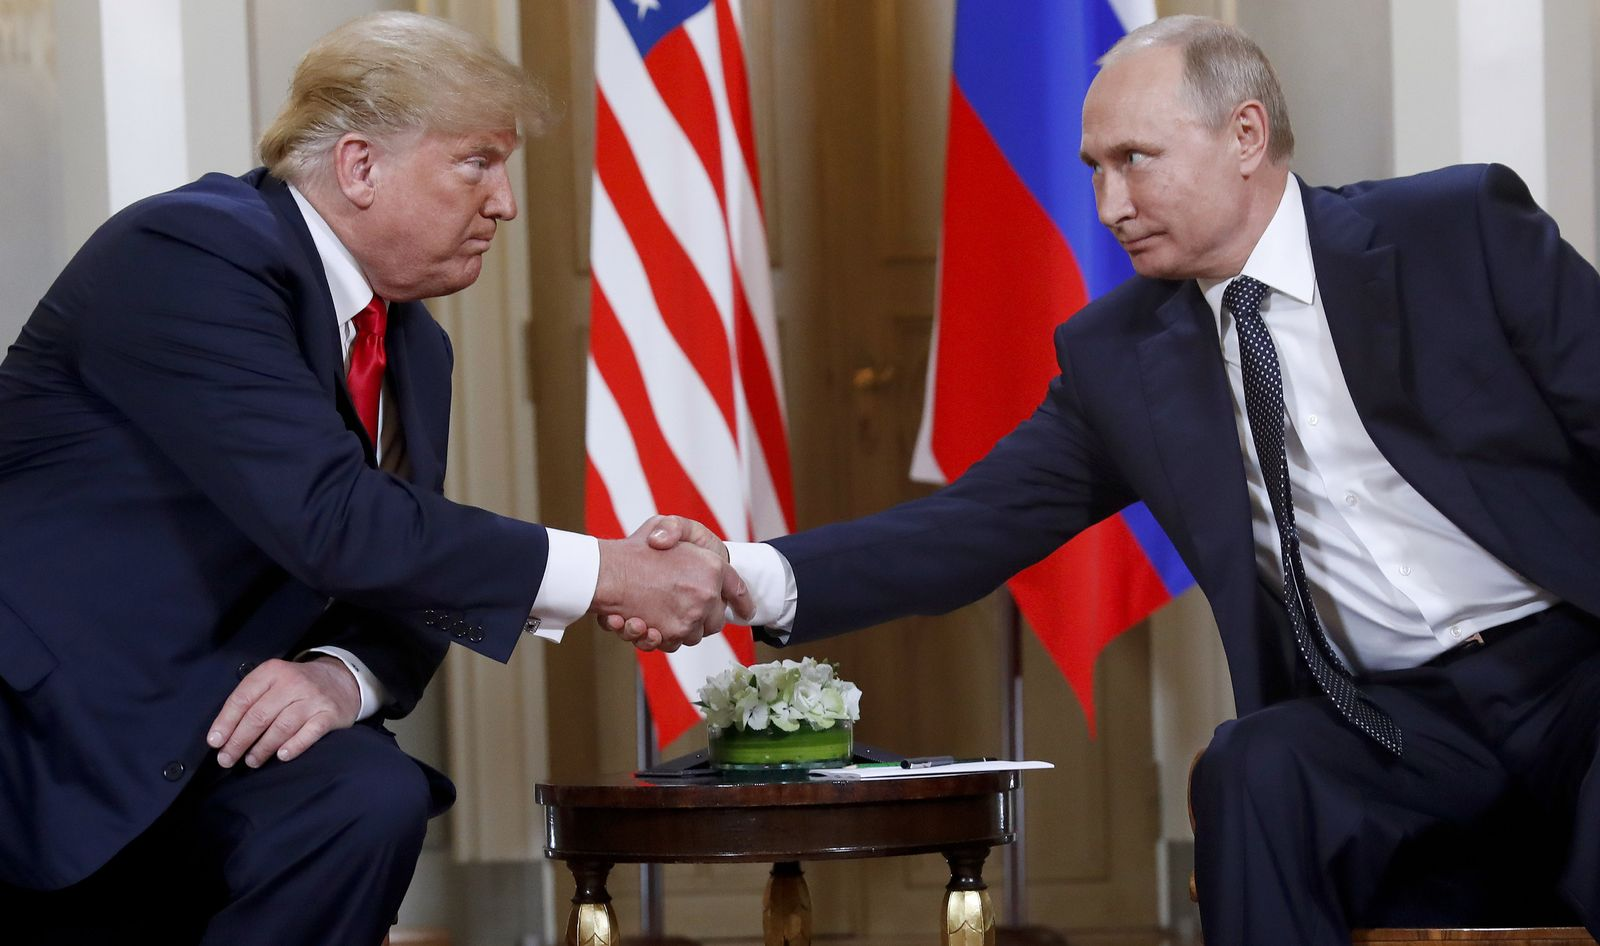 YE Finland Trump Putin Summit